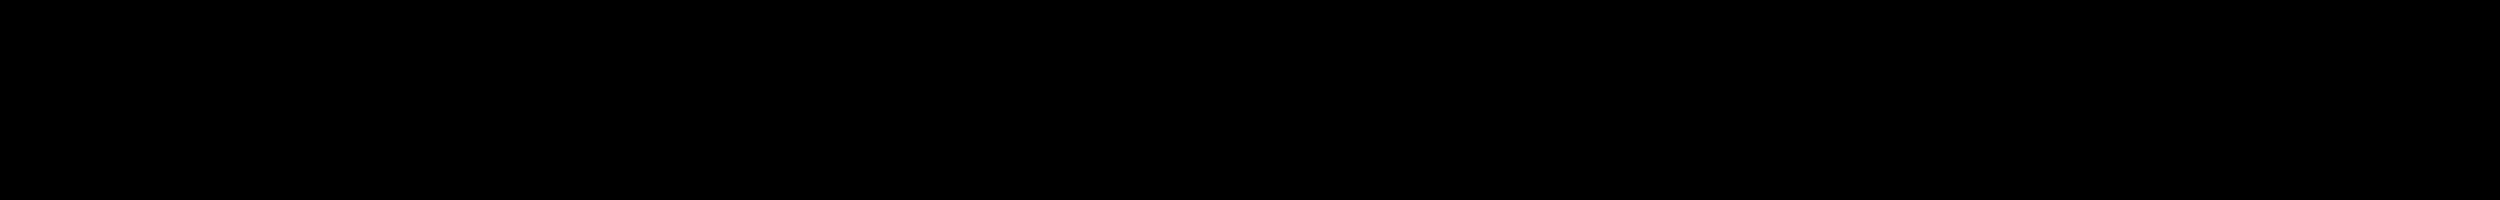 Burberry_wordmark_logo_logotype.png